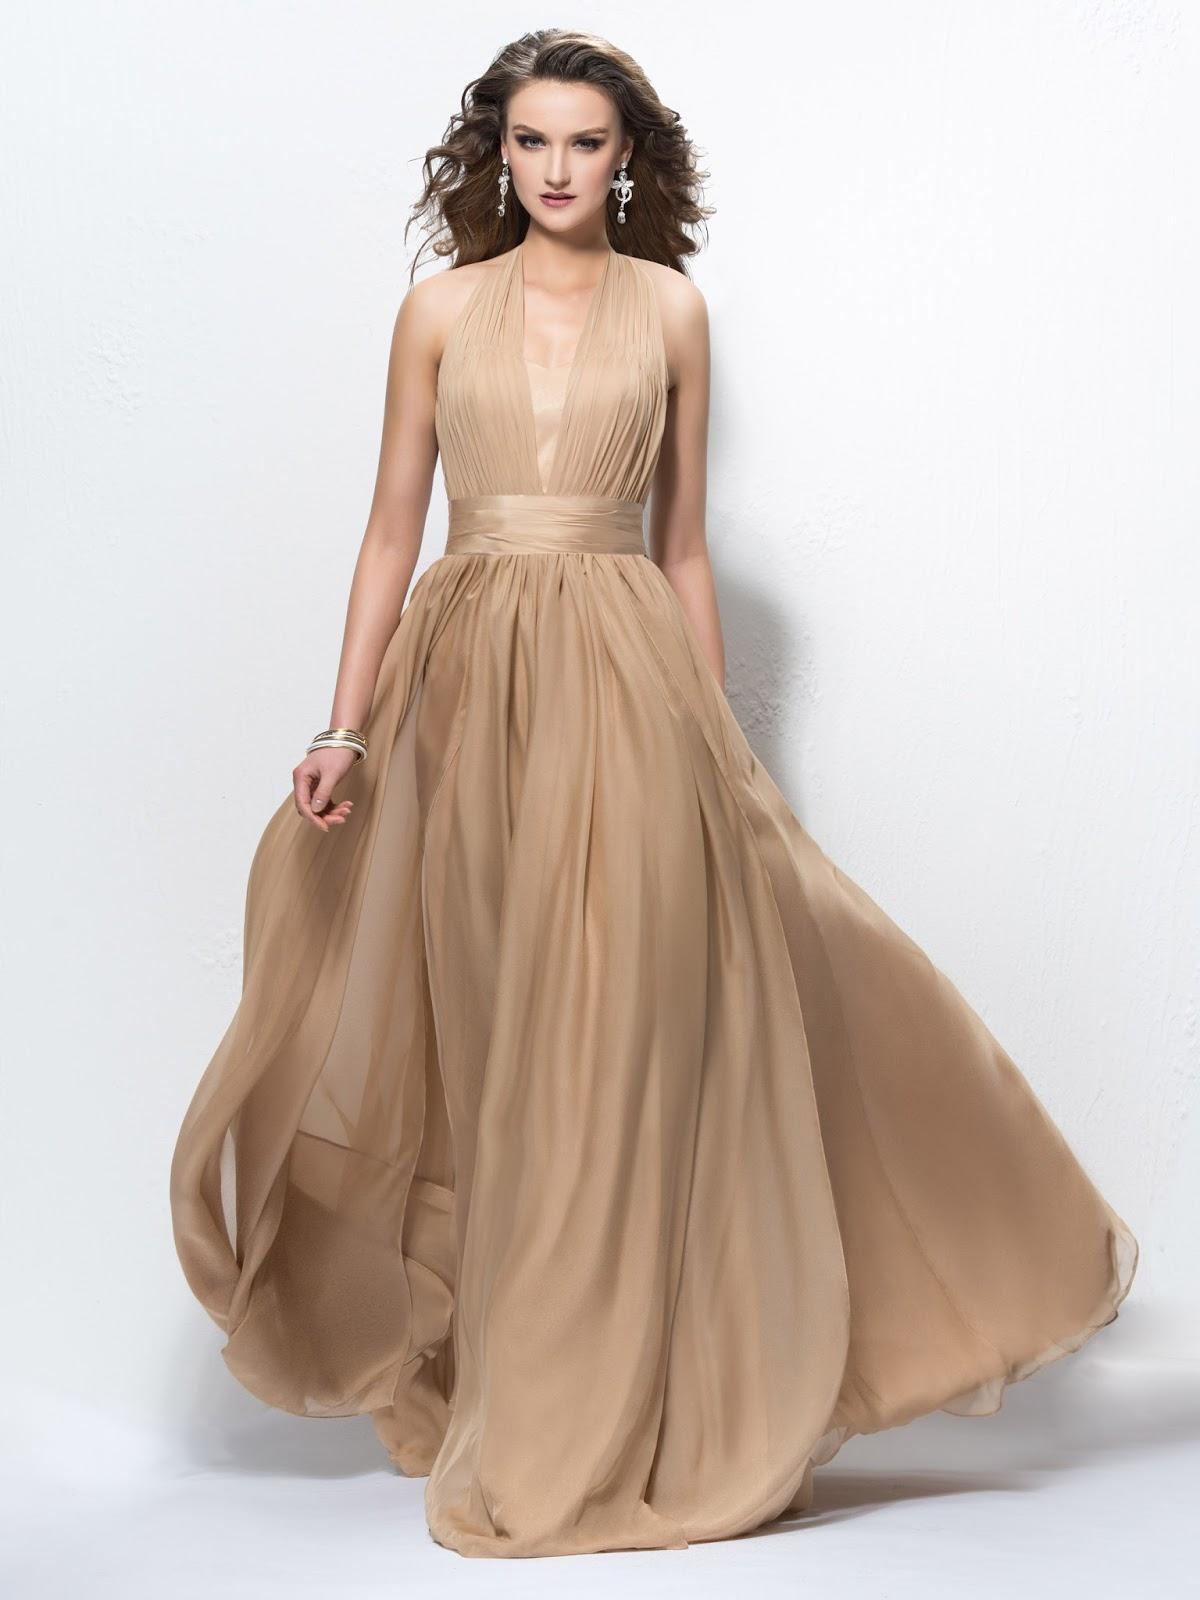 Charming A-Line Halter Sequins Zipper-Up Ruffles Floor Length Designer/Evening Dress, vestido de festa, party dress